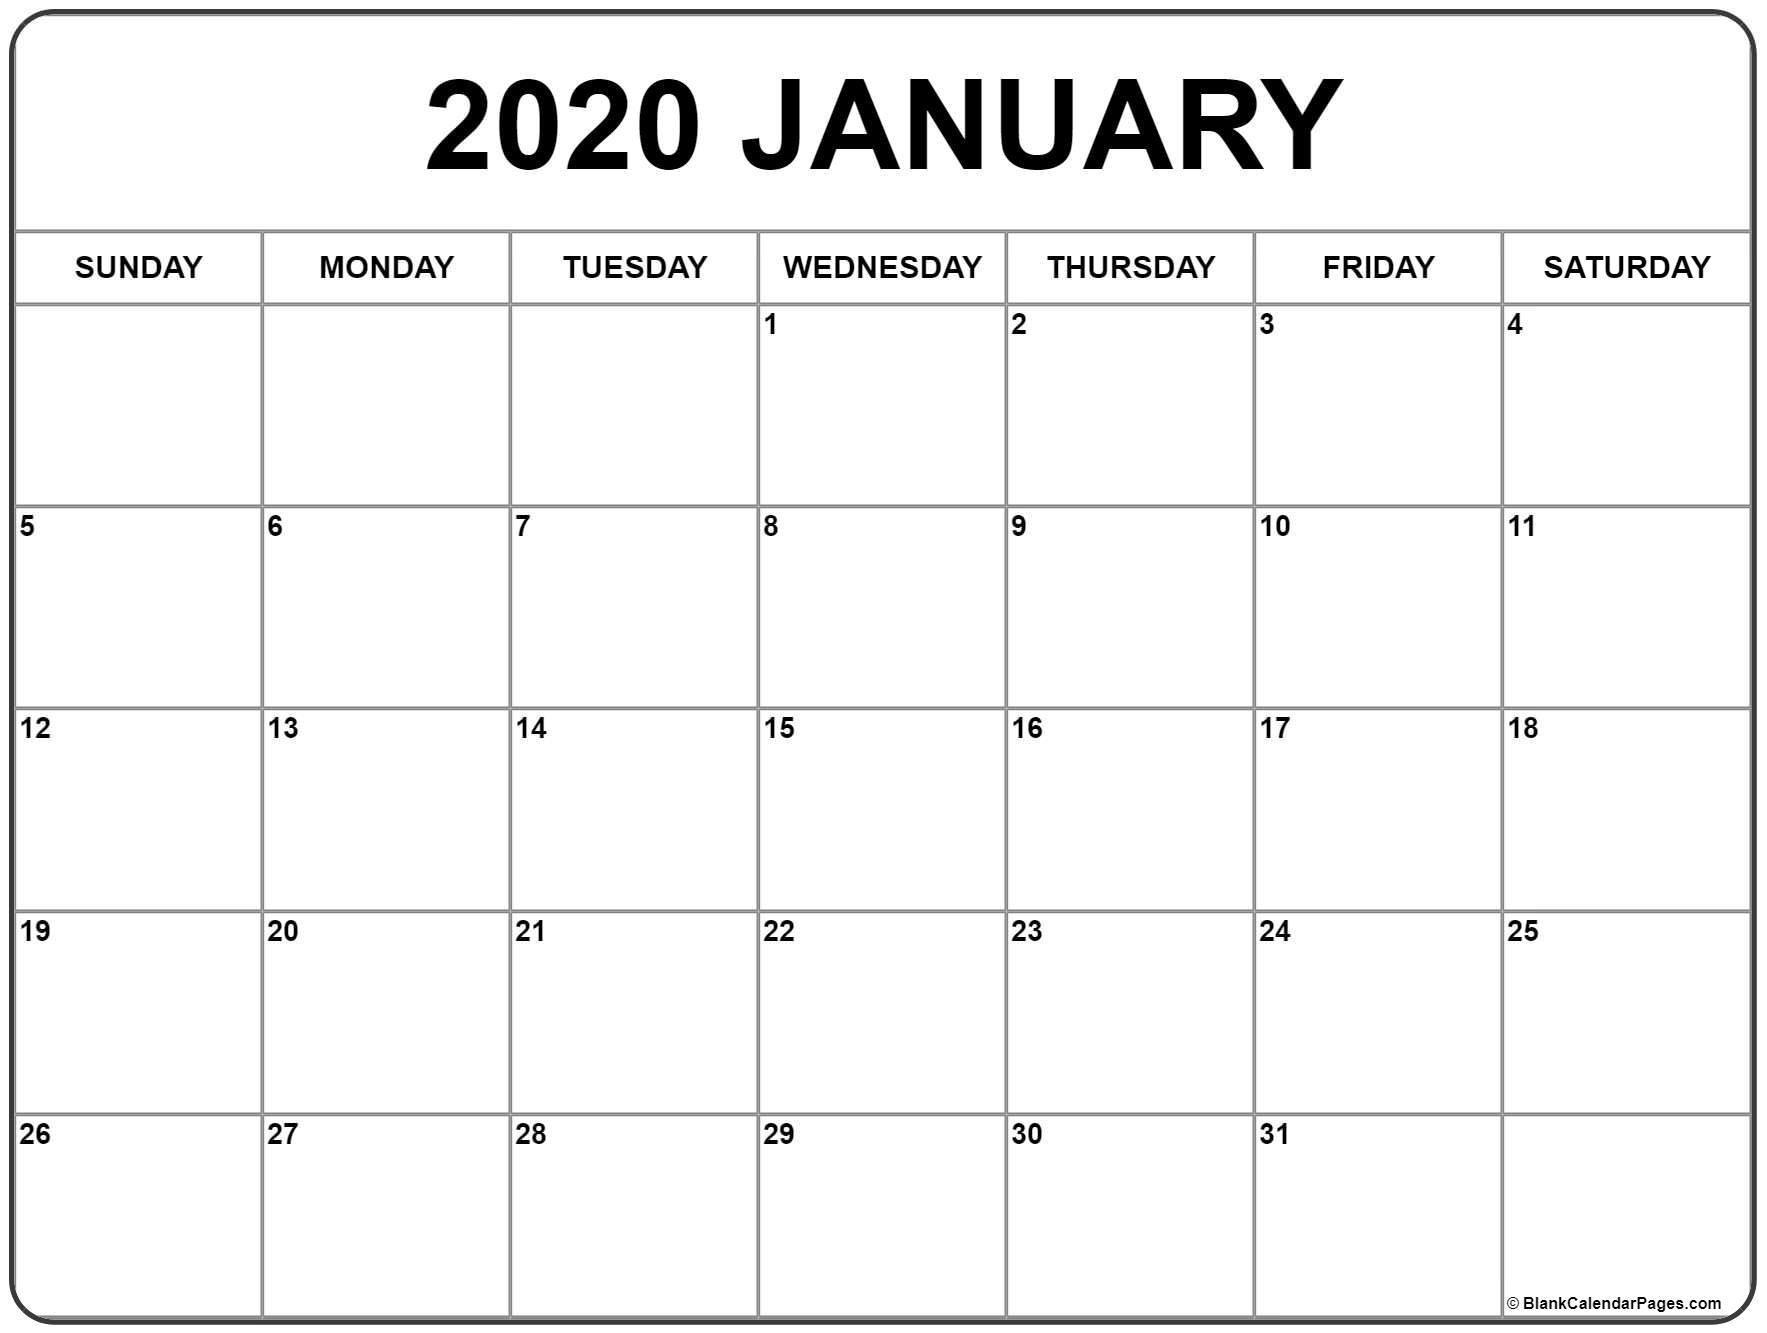 January 2020 Calendar | Free Printable Monthly Calendars for 2020 Imom Calendar Printable